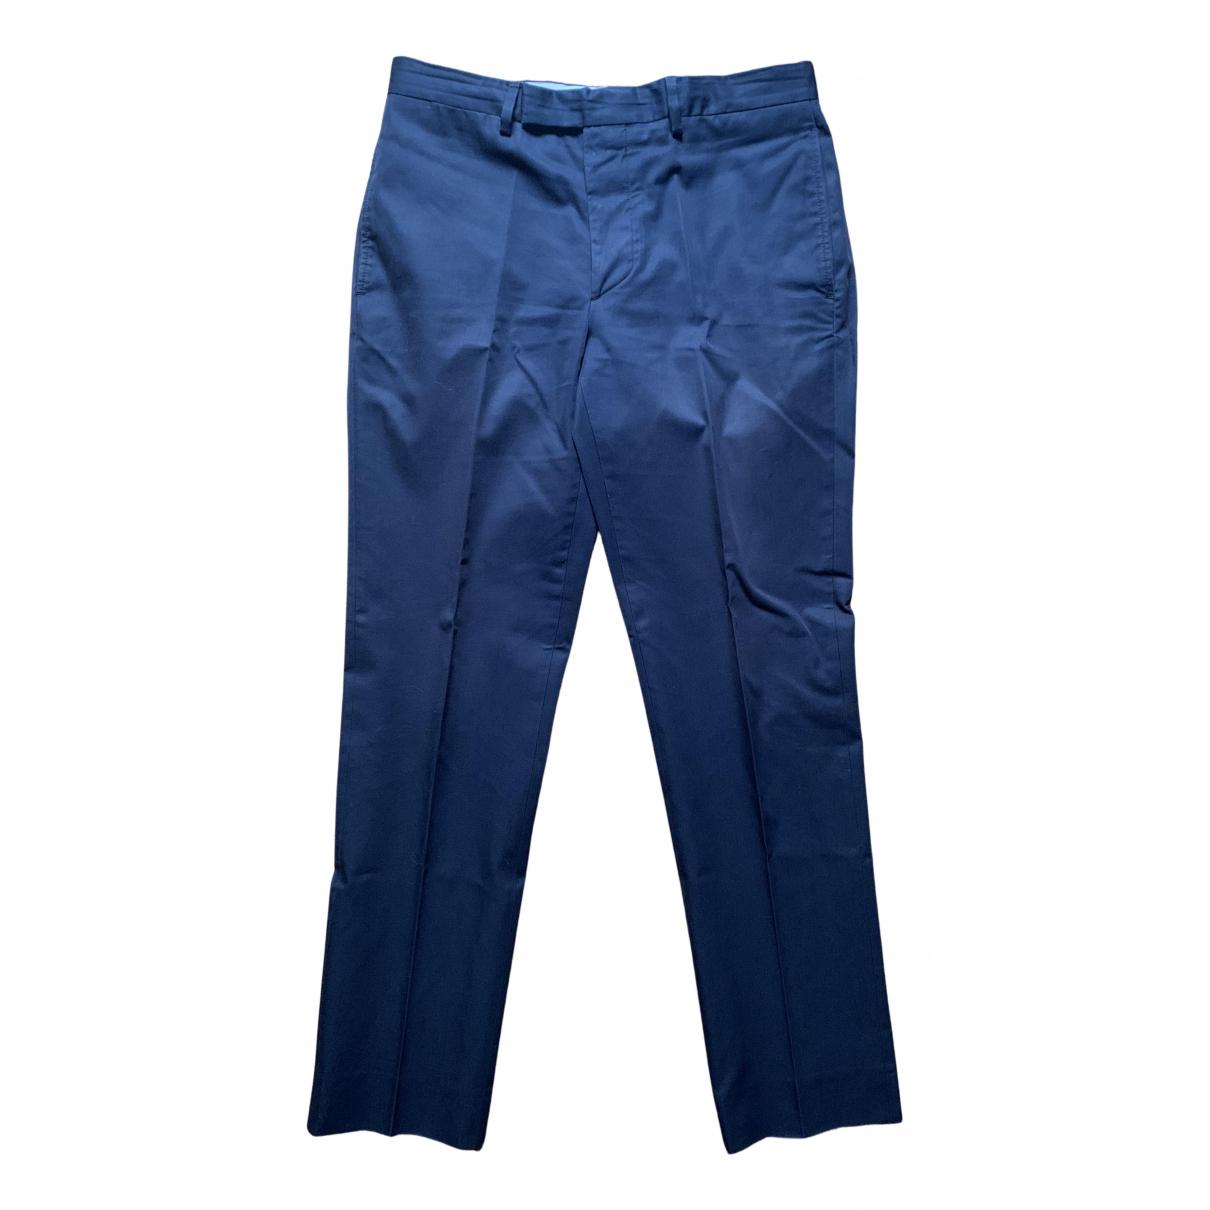 Pantalones en Algodon Marino Officine Generale